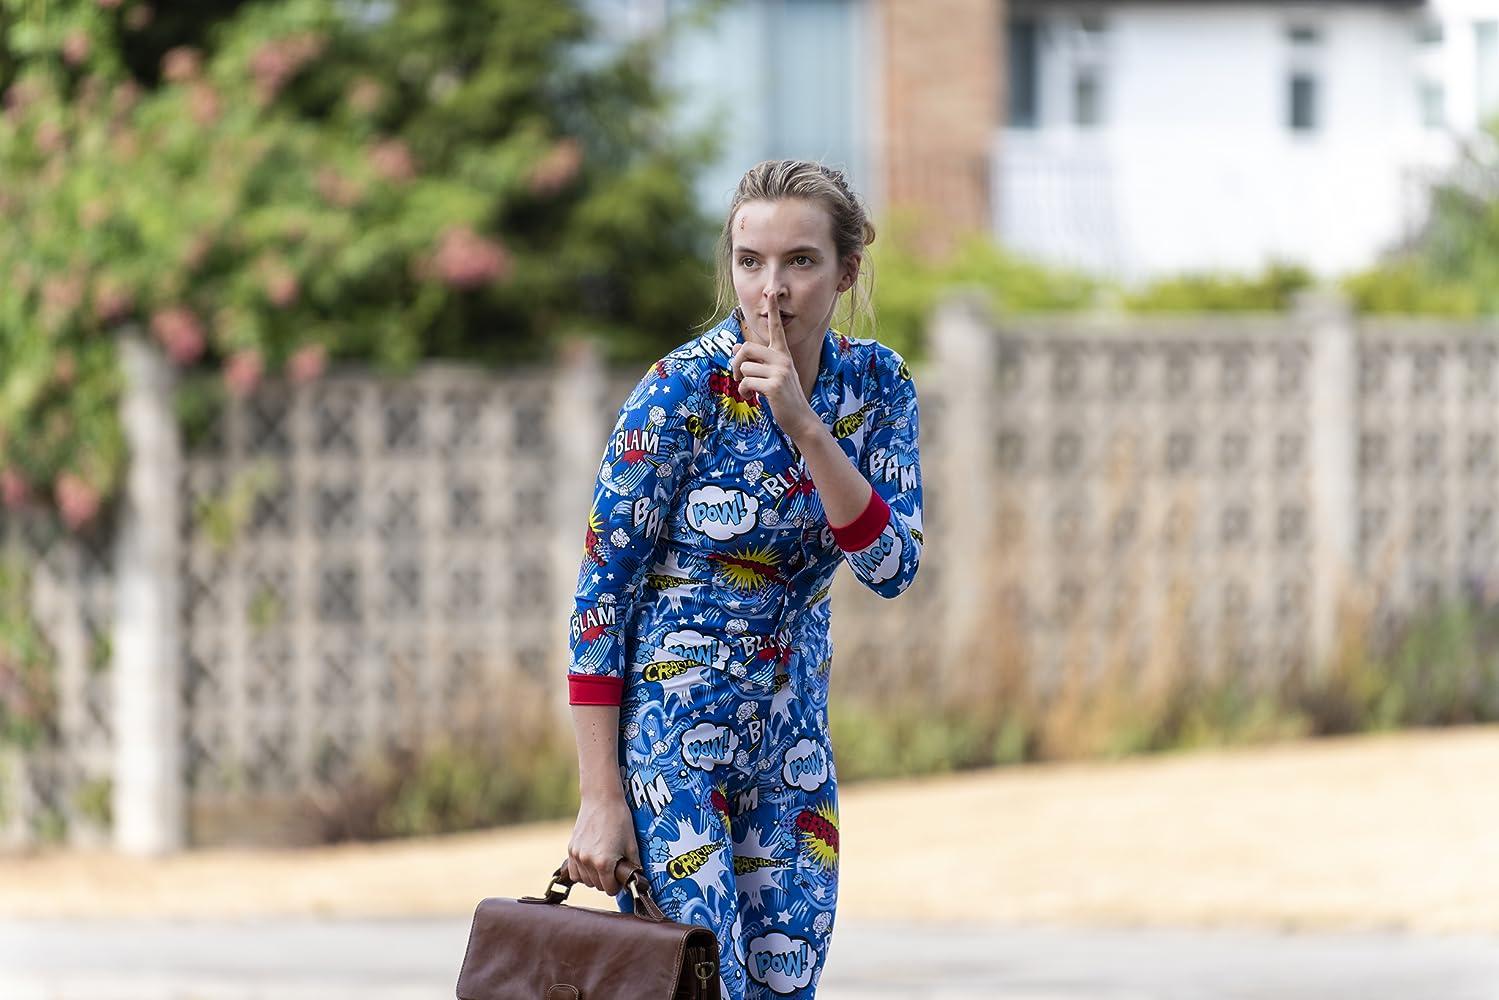 Jodie Comer in Killing Eve (2018)